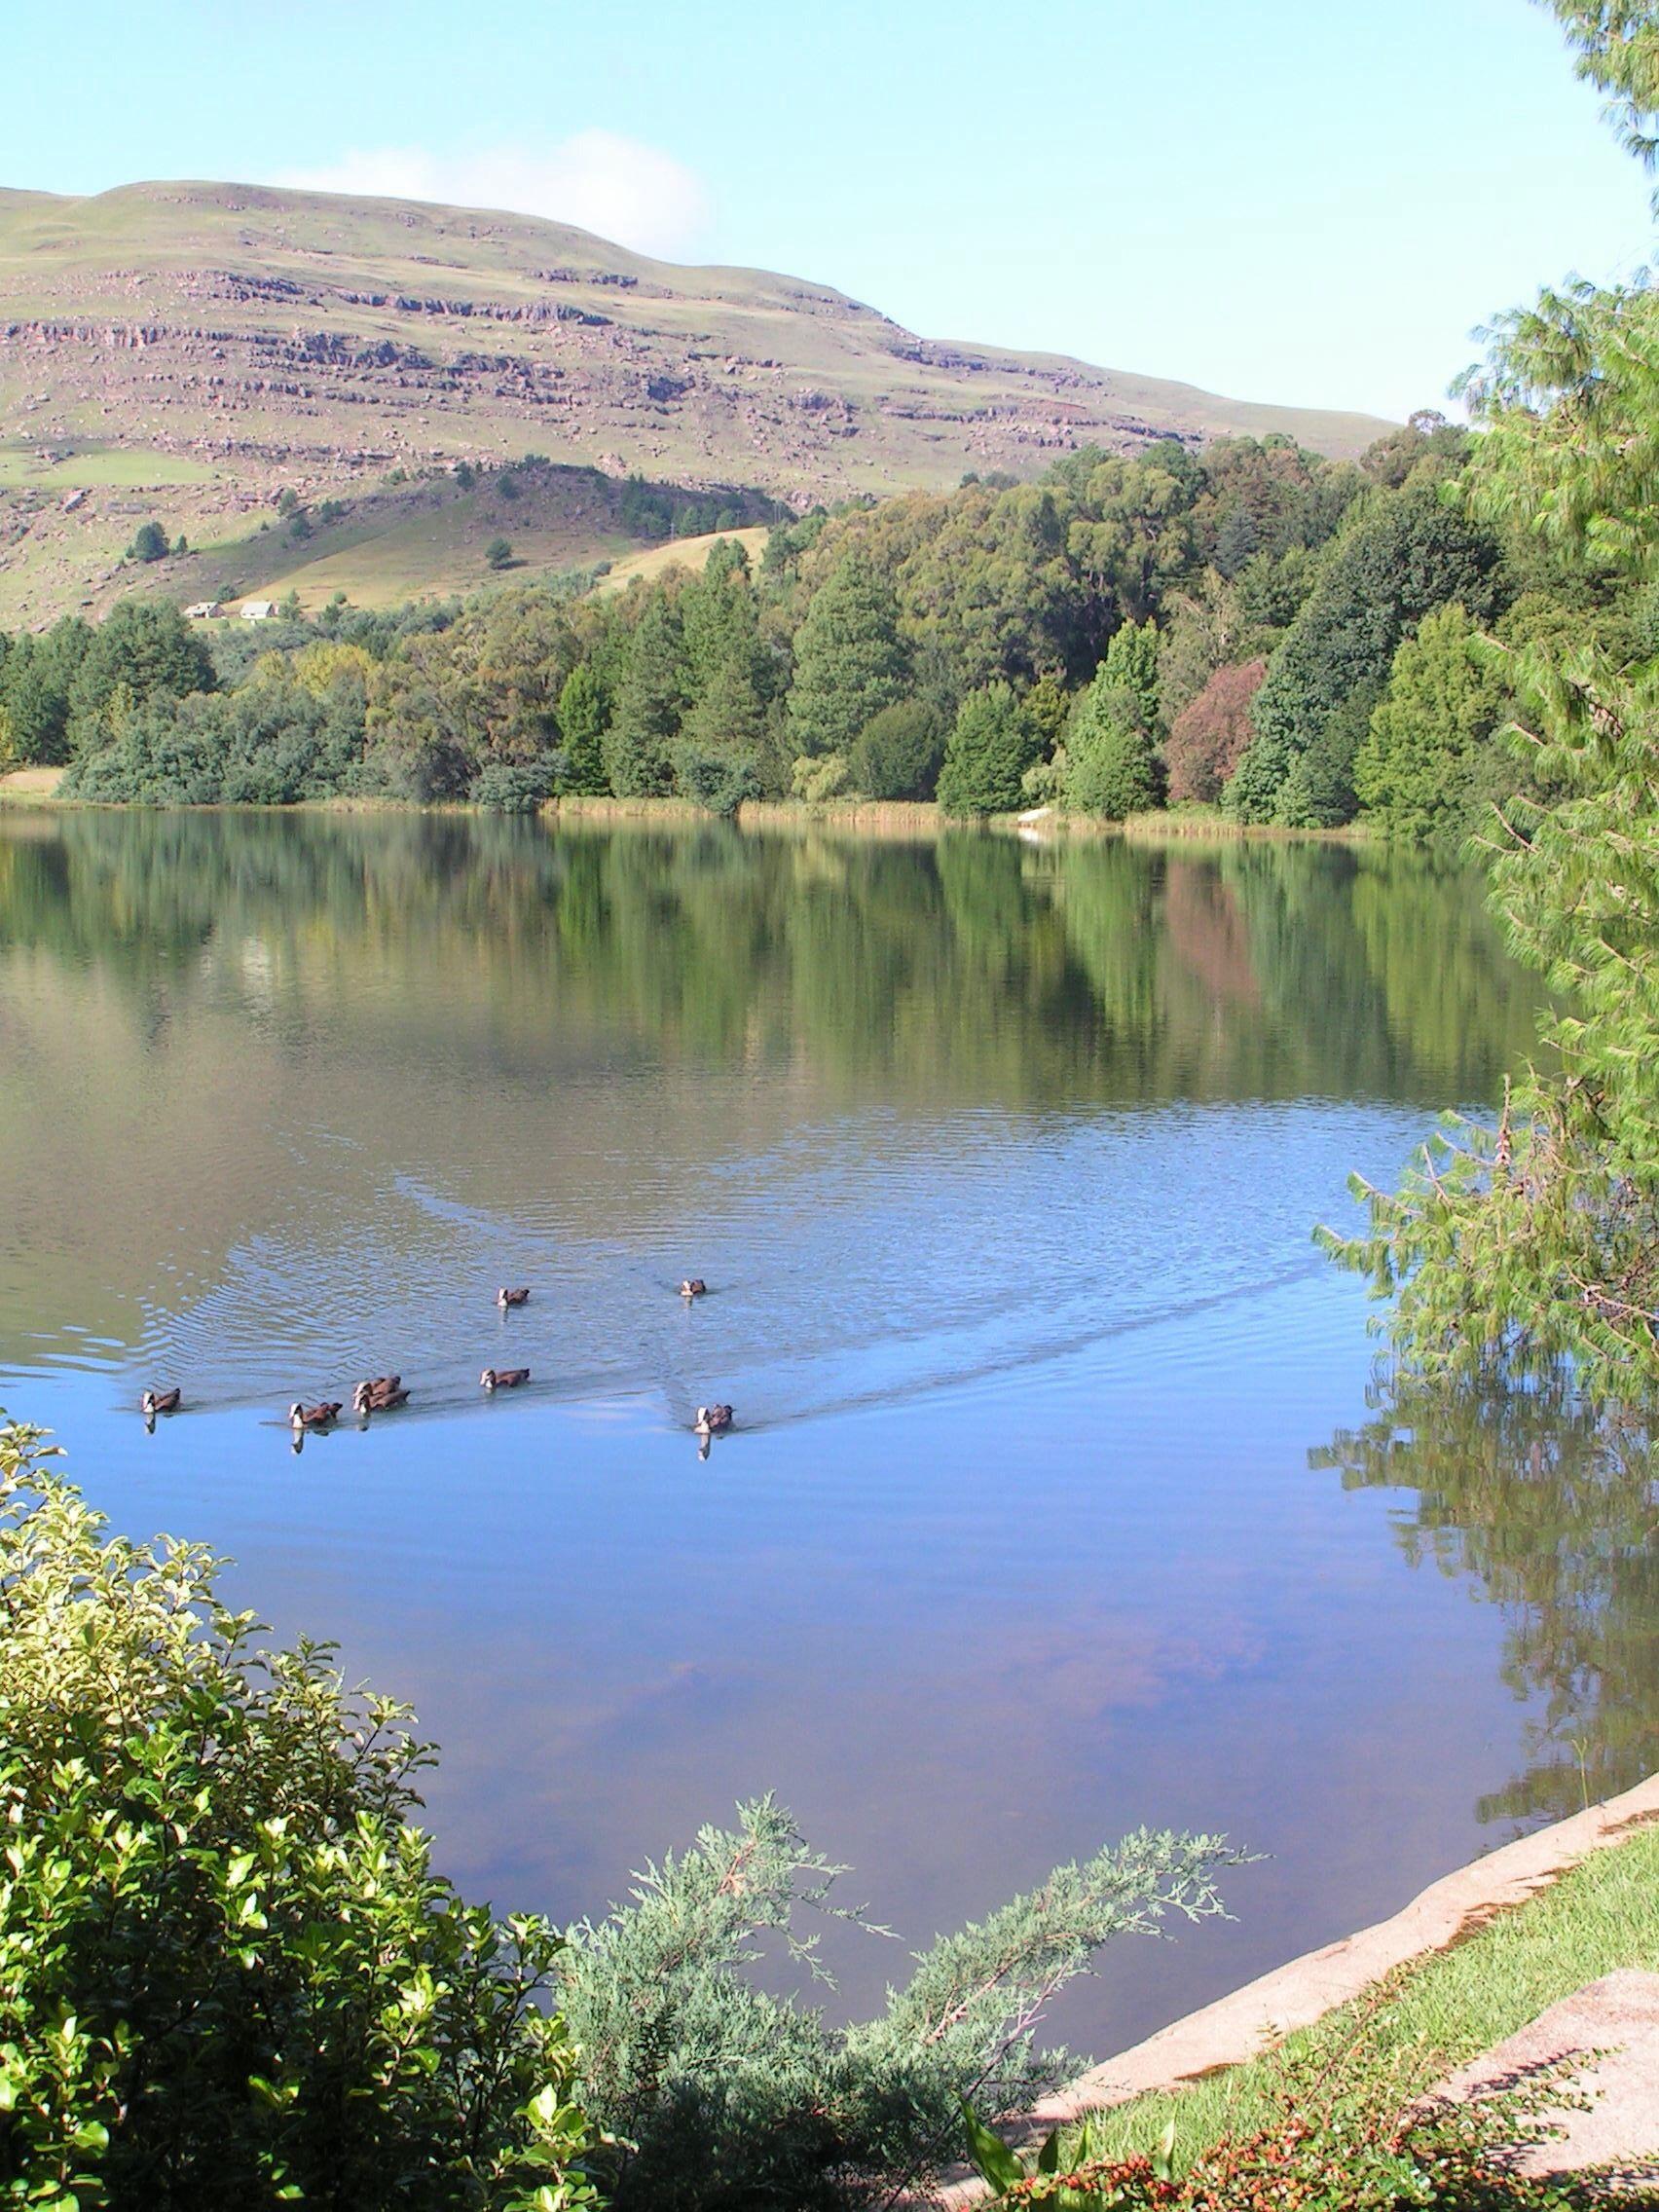 Drakensberg south africa places to visit africa landscape